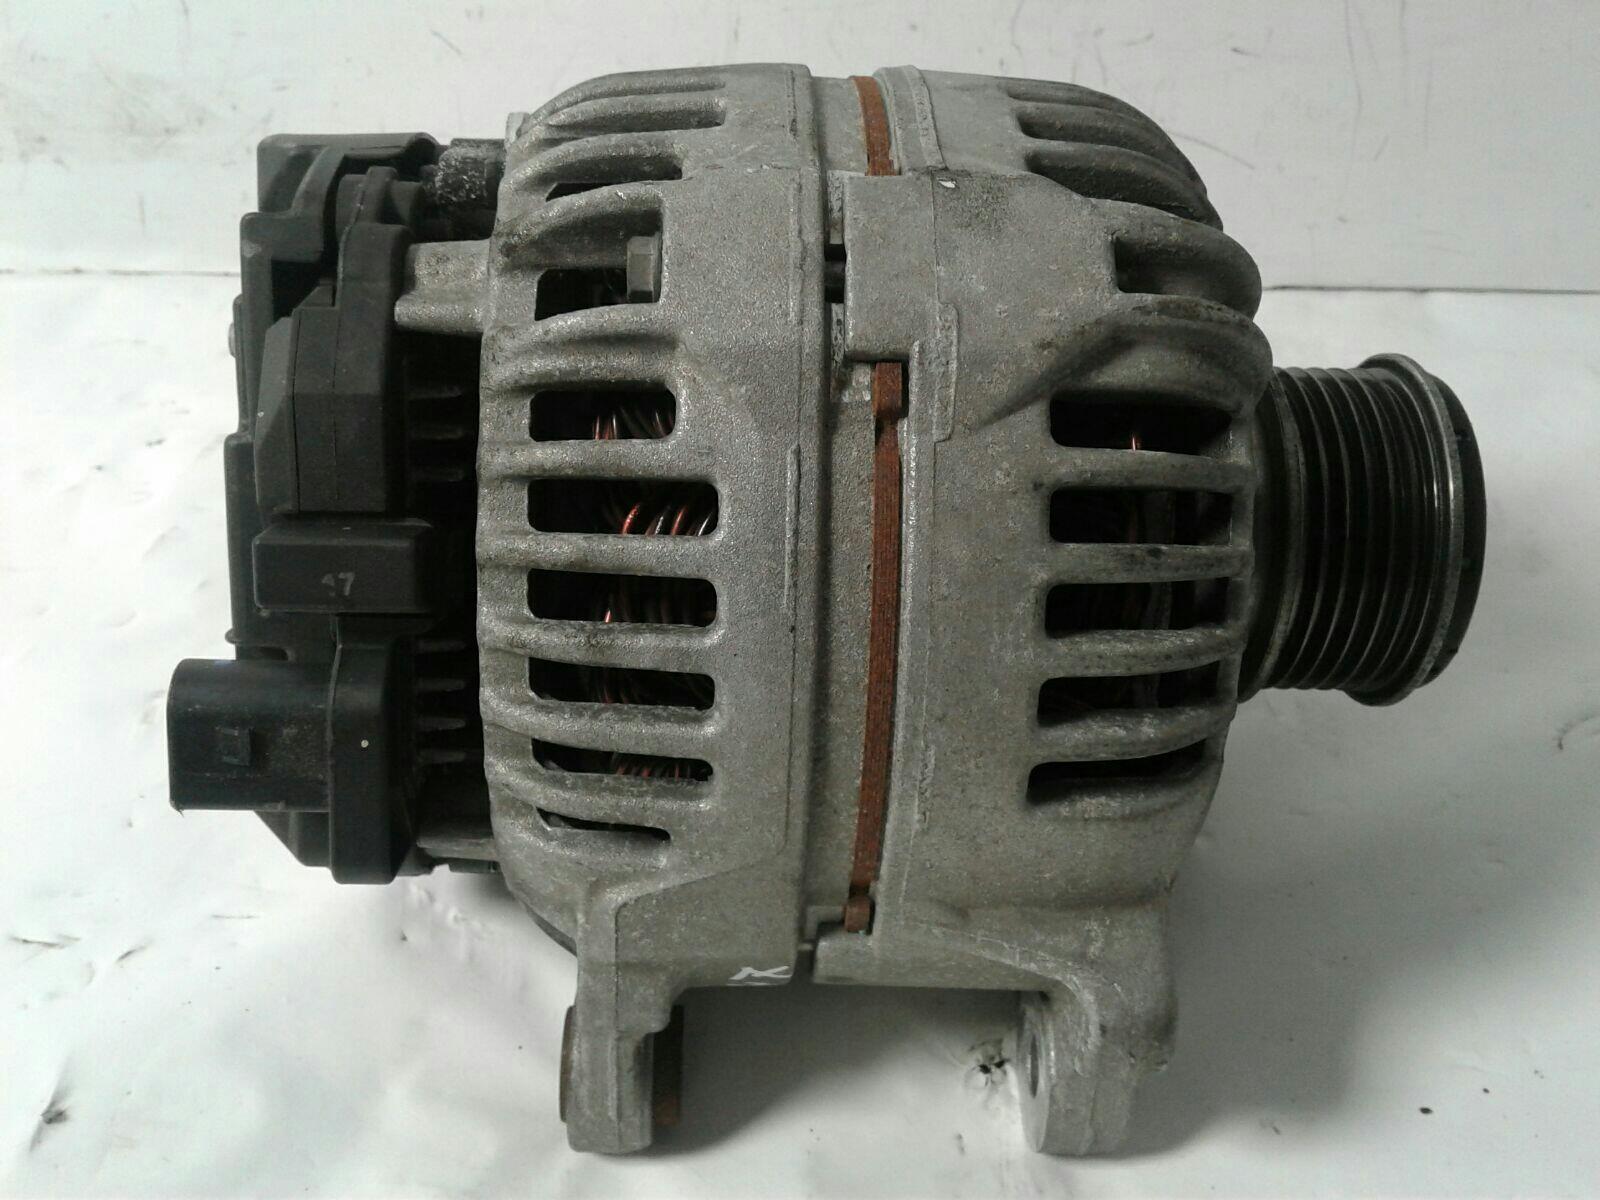 audi a3 2008 to 2013 alternator petrol manual for sale from rh motorhog co uk Audi A3 Owner Manual Audi A3 Owner Manual